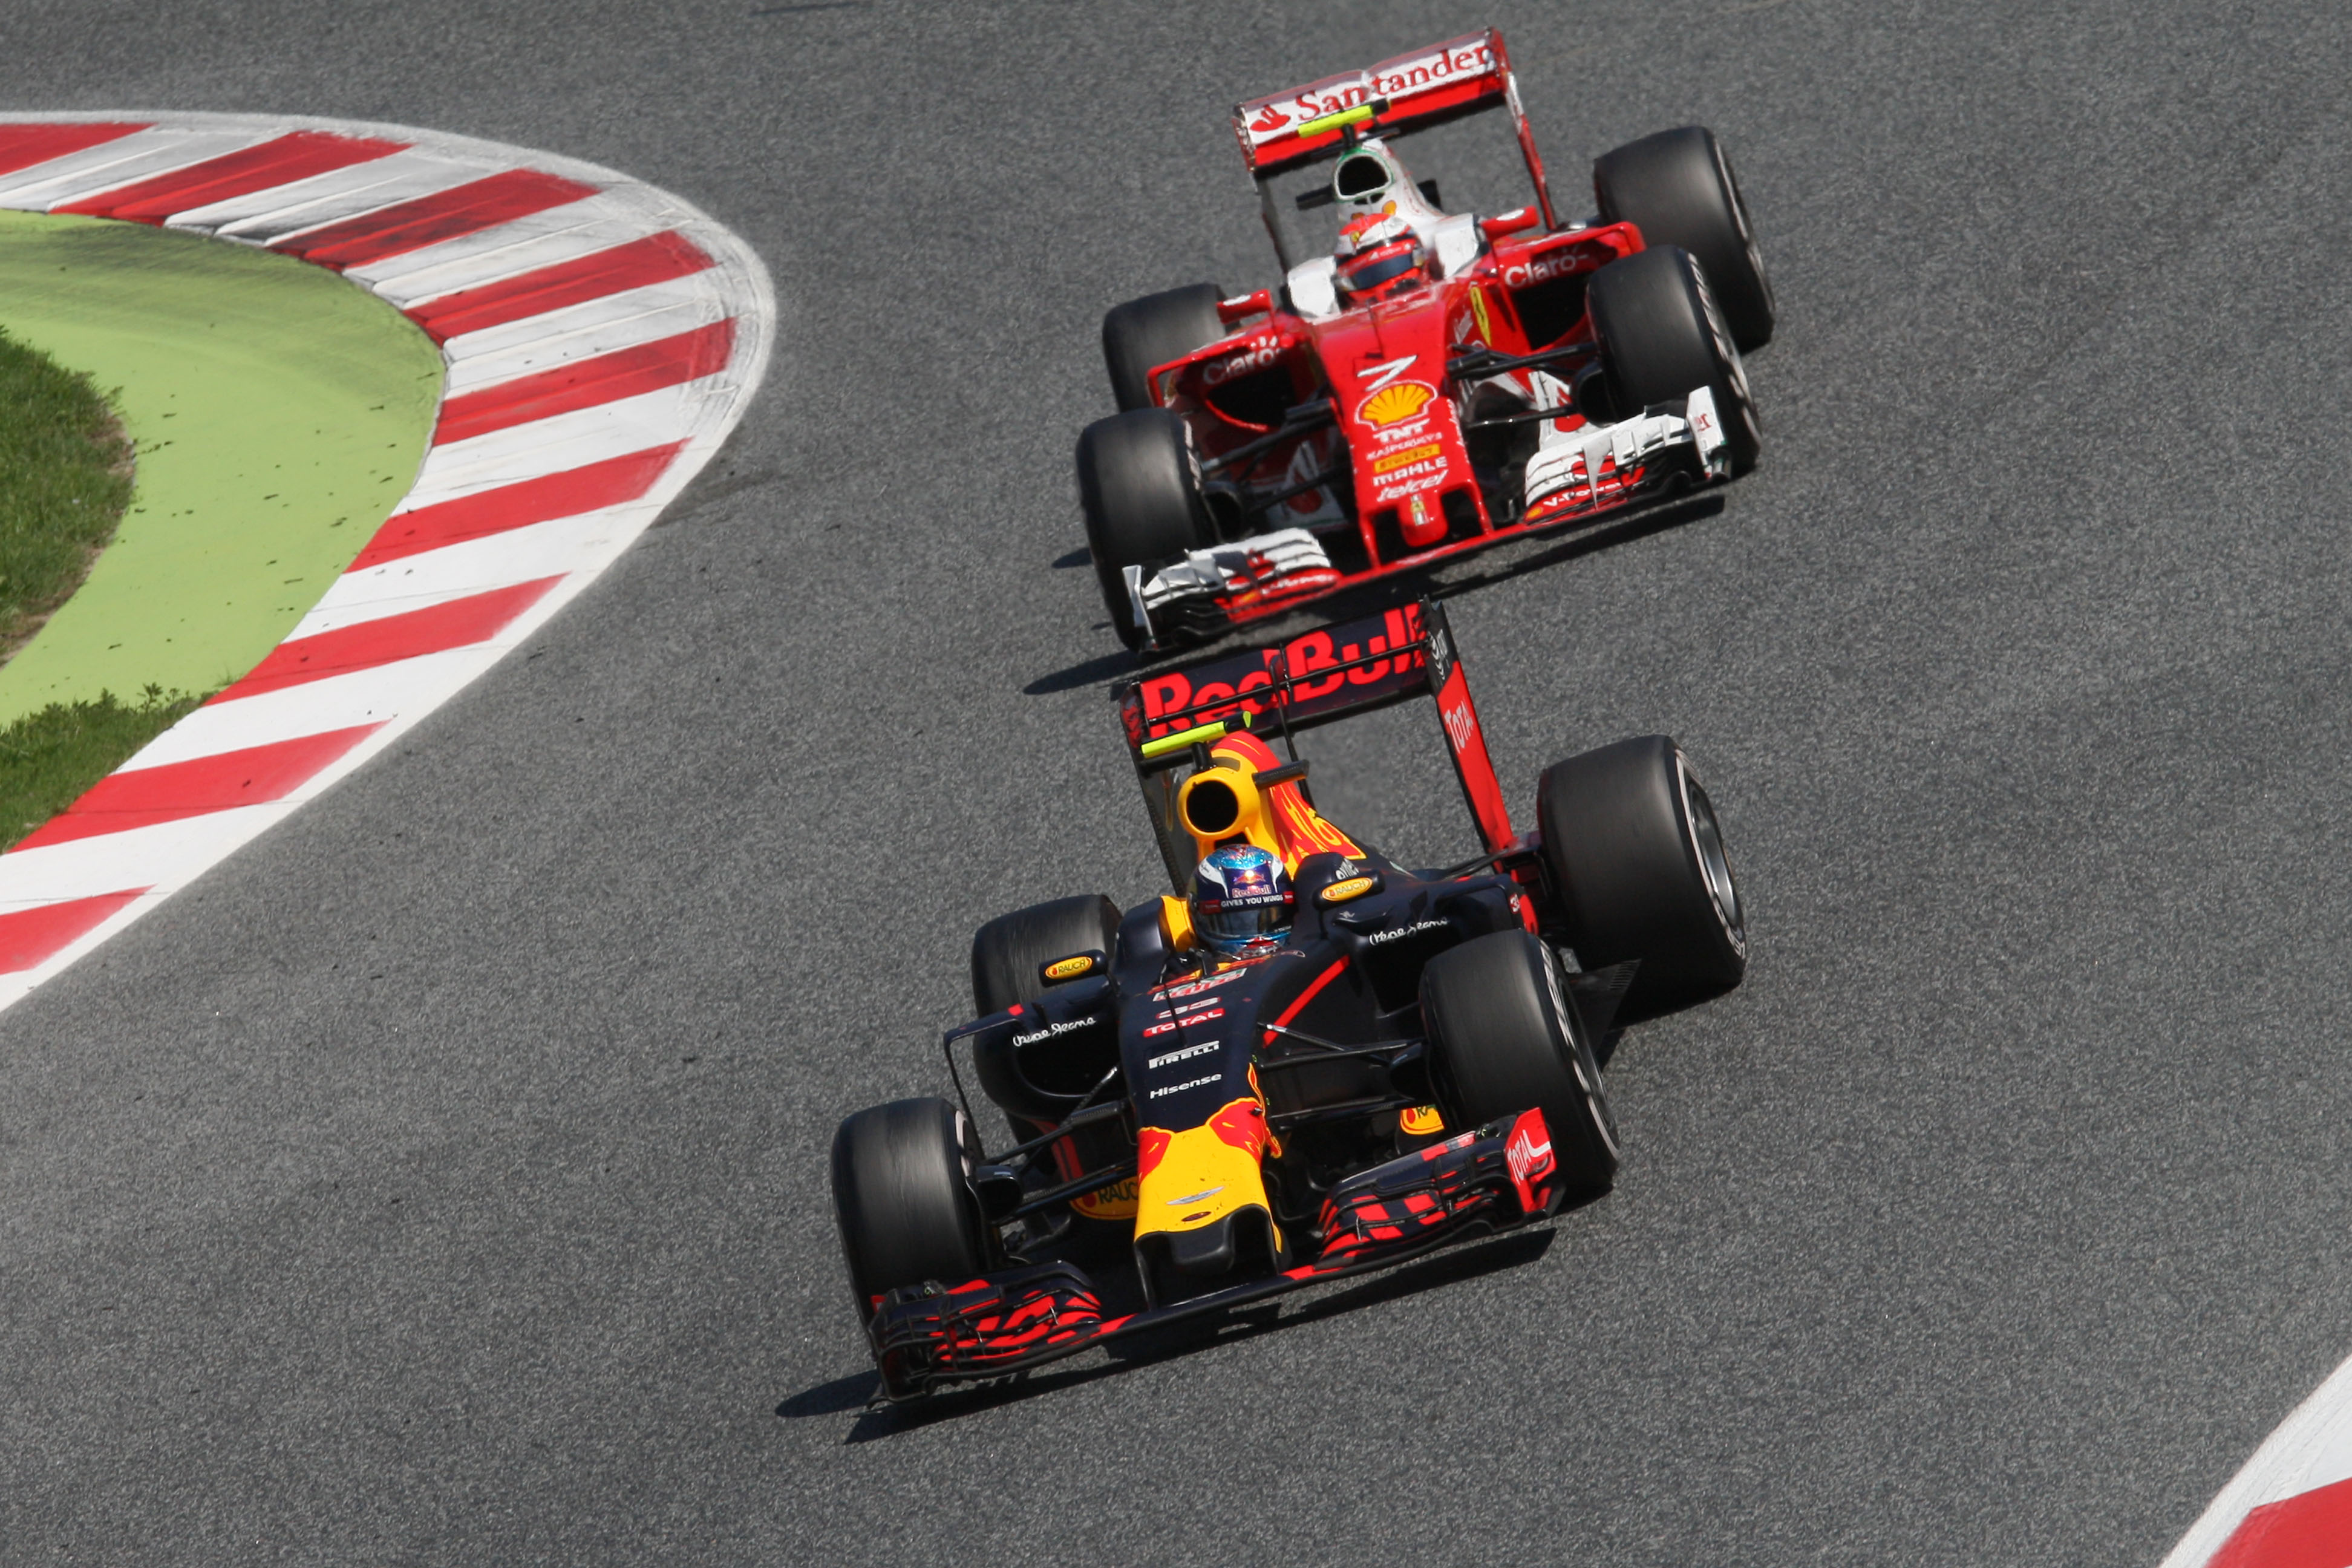 Max Verstappen Red Bull Kimi Raikkonen Ferrari Spanish Grand Prix 2016 Barcelona